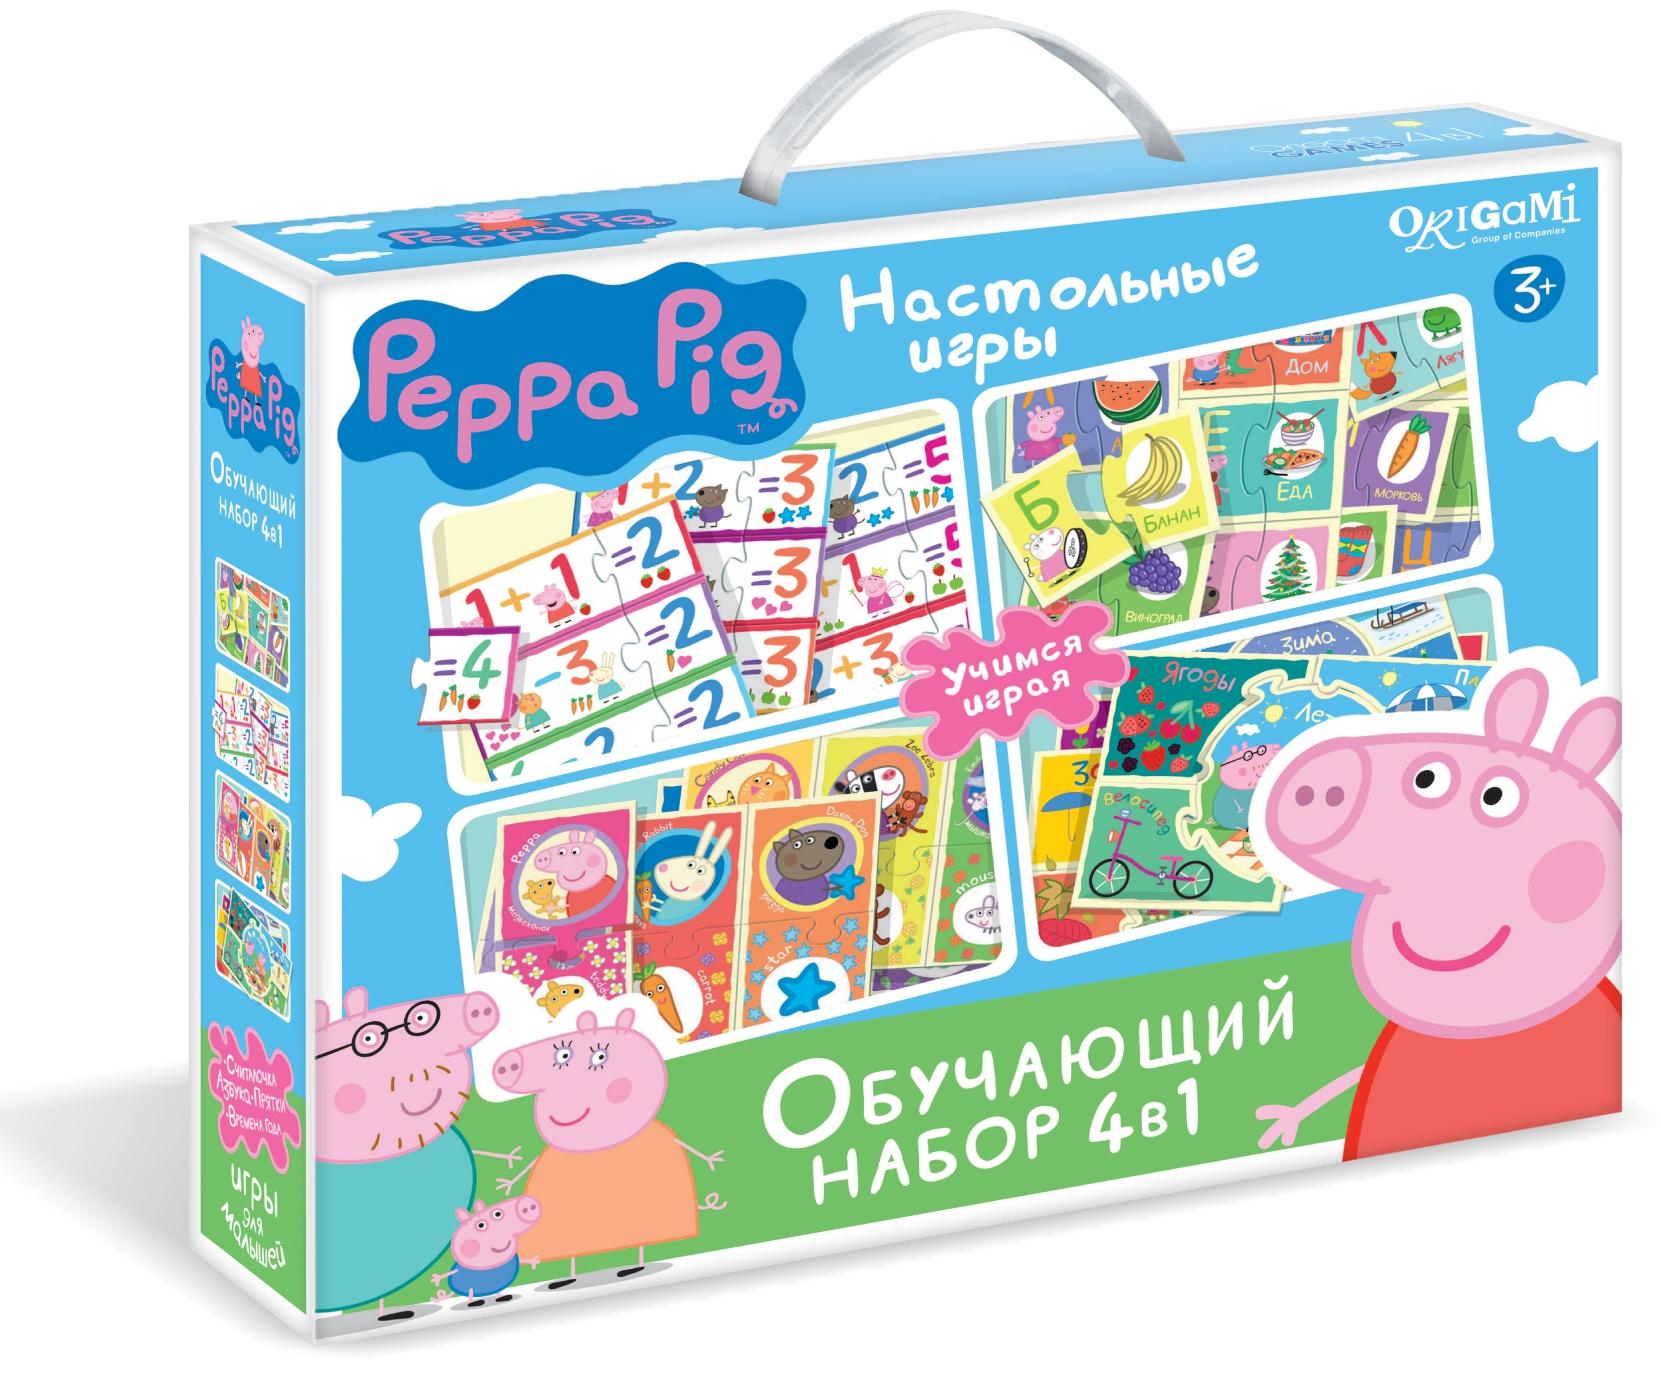 Peppa Pig Peppa Pig Обучающий набор Origami «Peppa Pig» 4 в 1 настольная игра origami peppa pig считалочка в чемоданчике